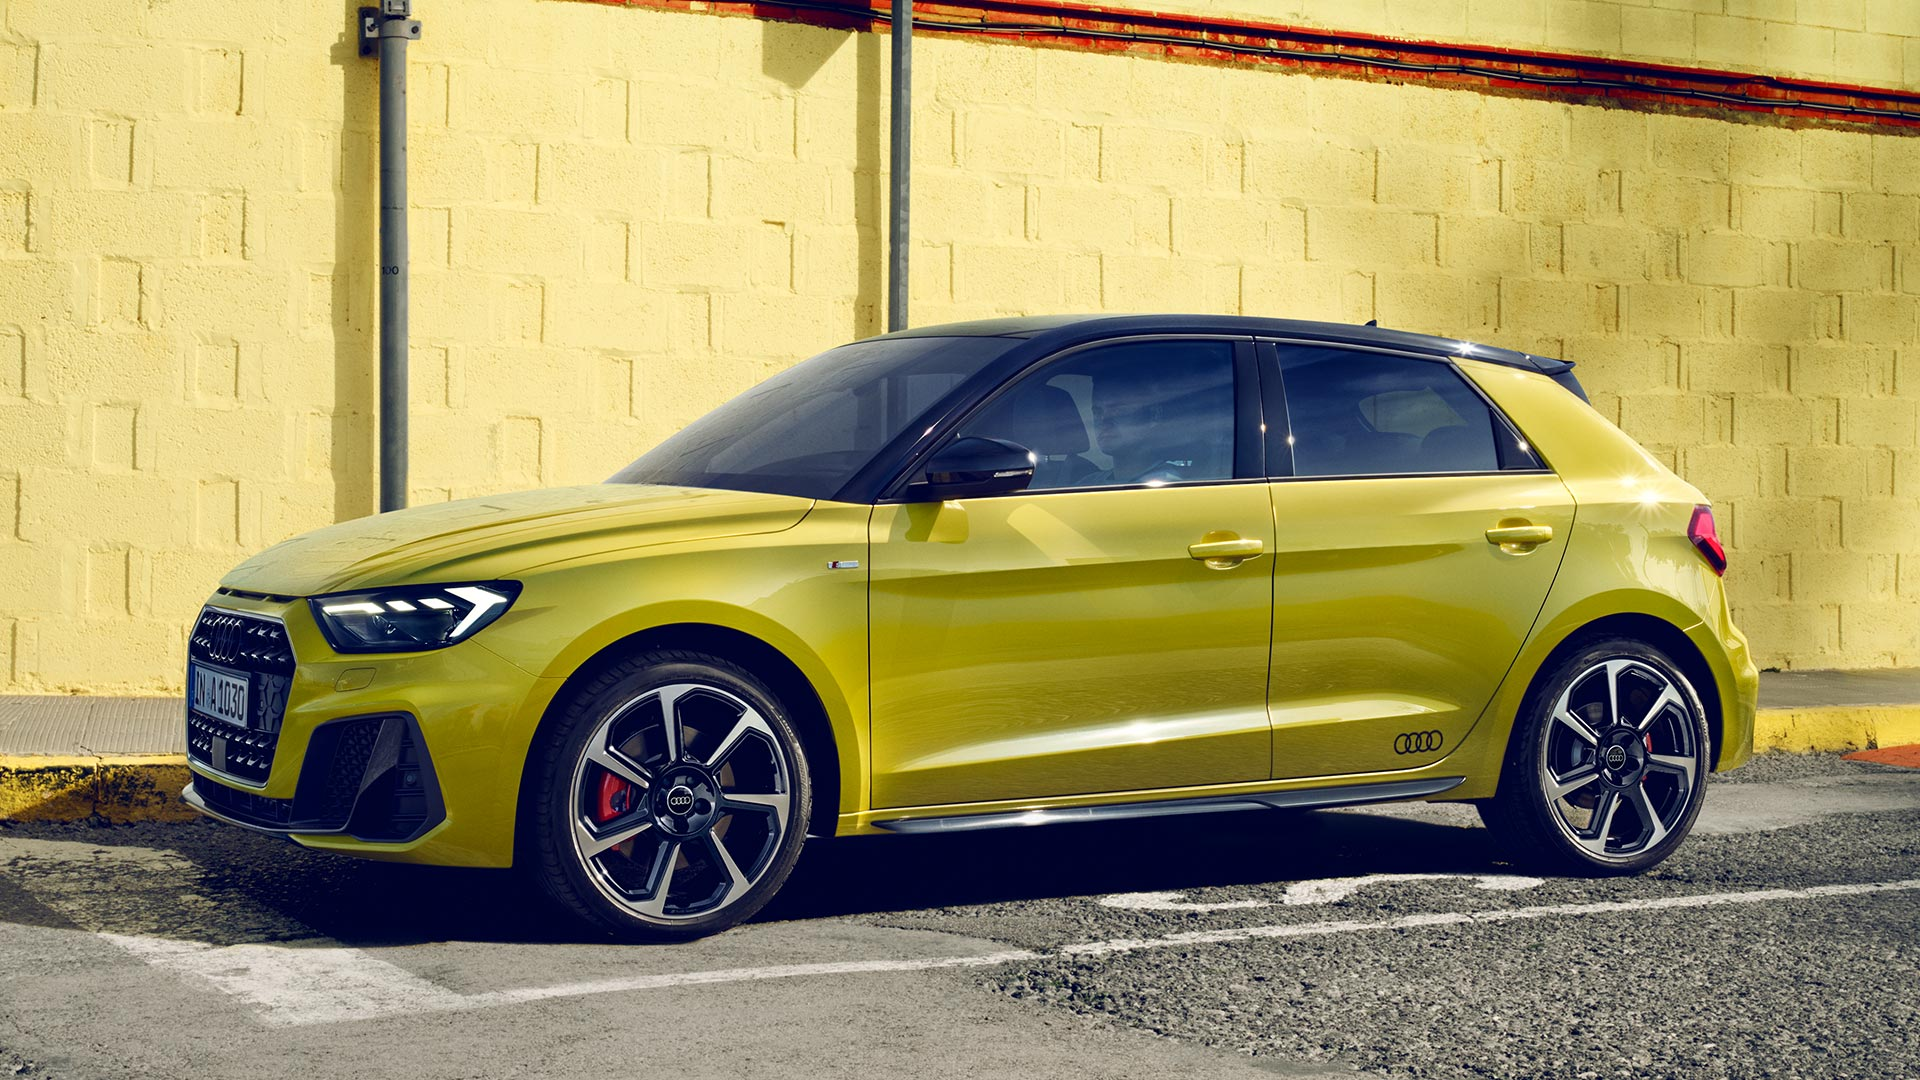 1920x1080 Audi A1 Sportback Exterior My2021 181002 1 Audi Zentrum Modena